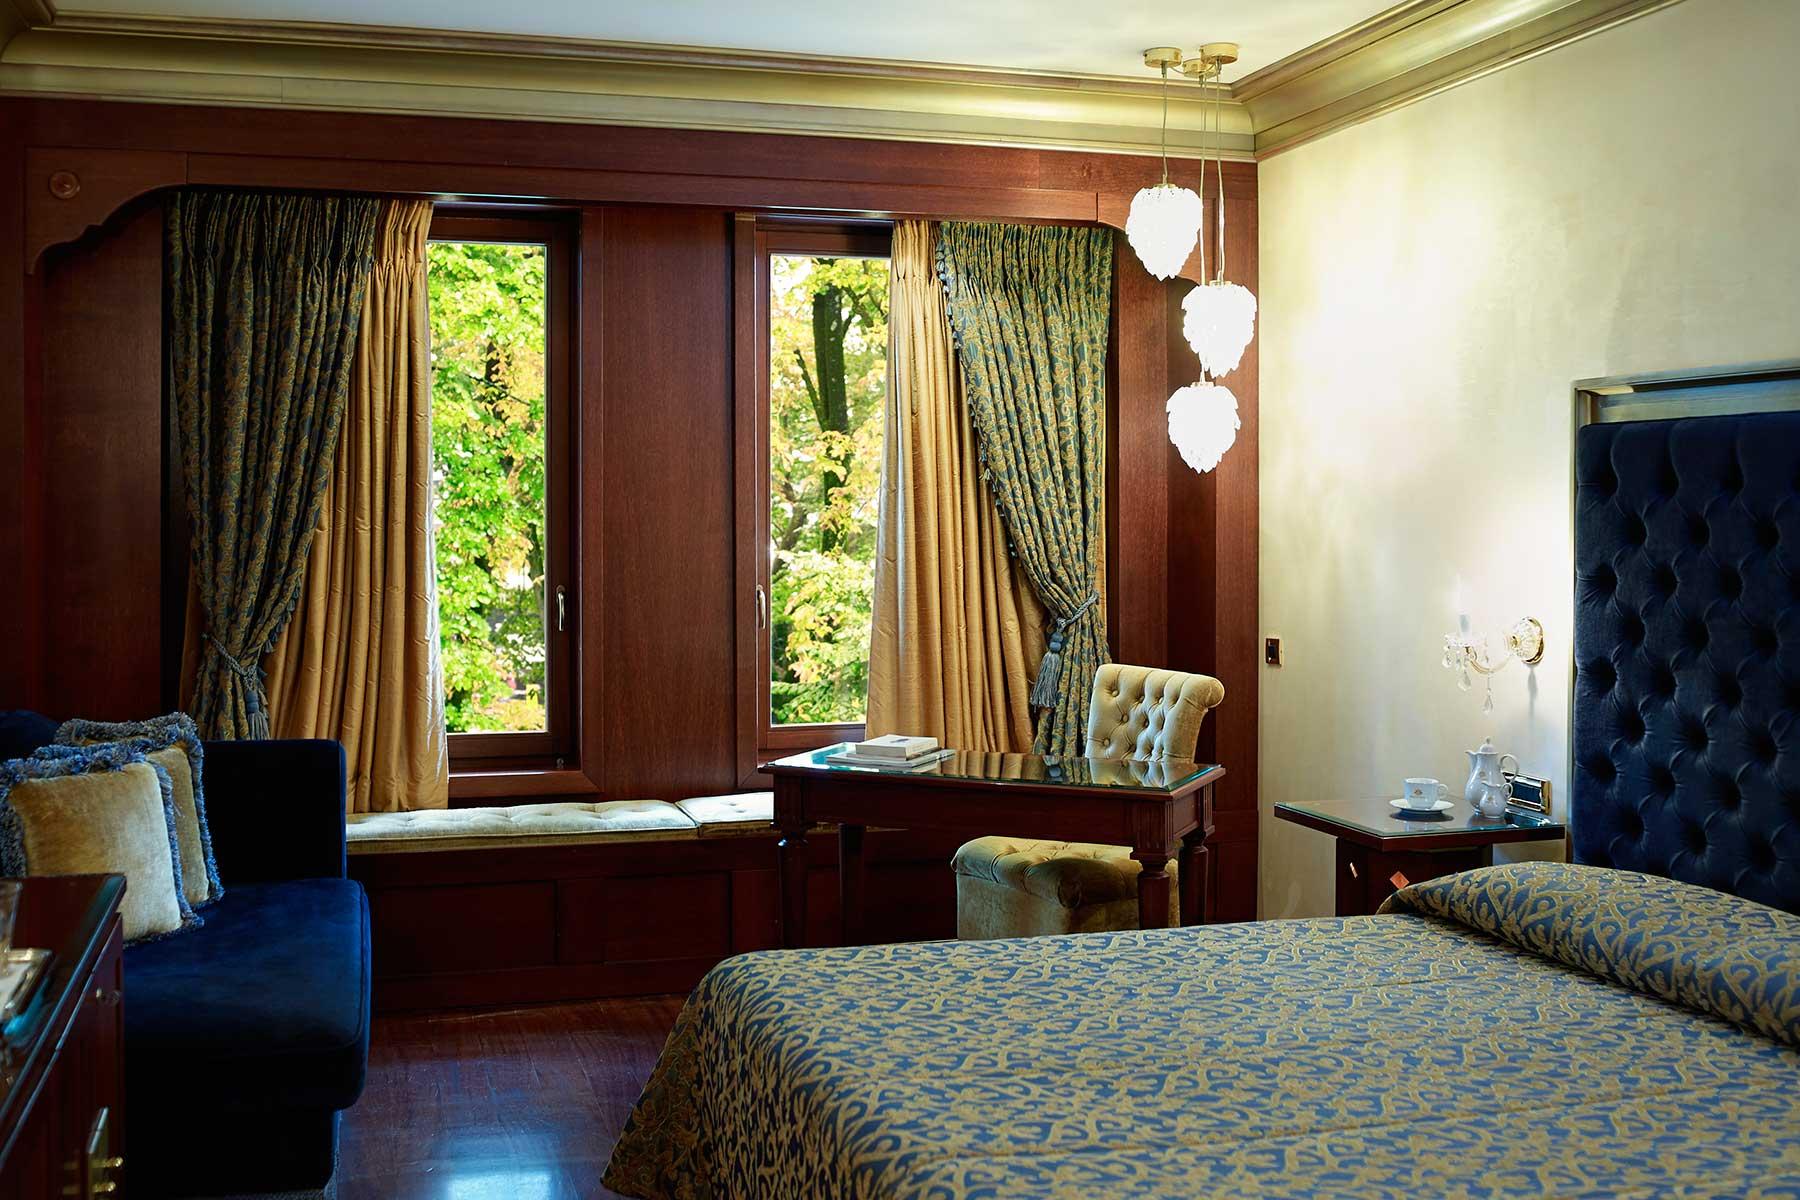 grand-serai-standart-double-room-ioannina-greece-1.jpg